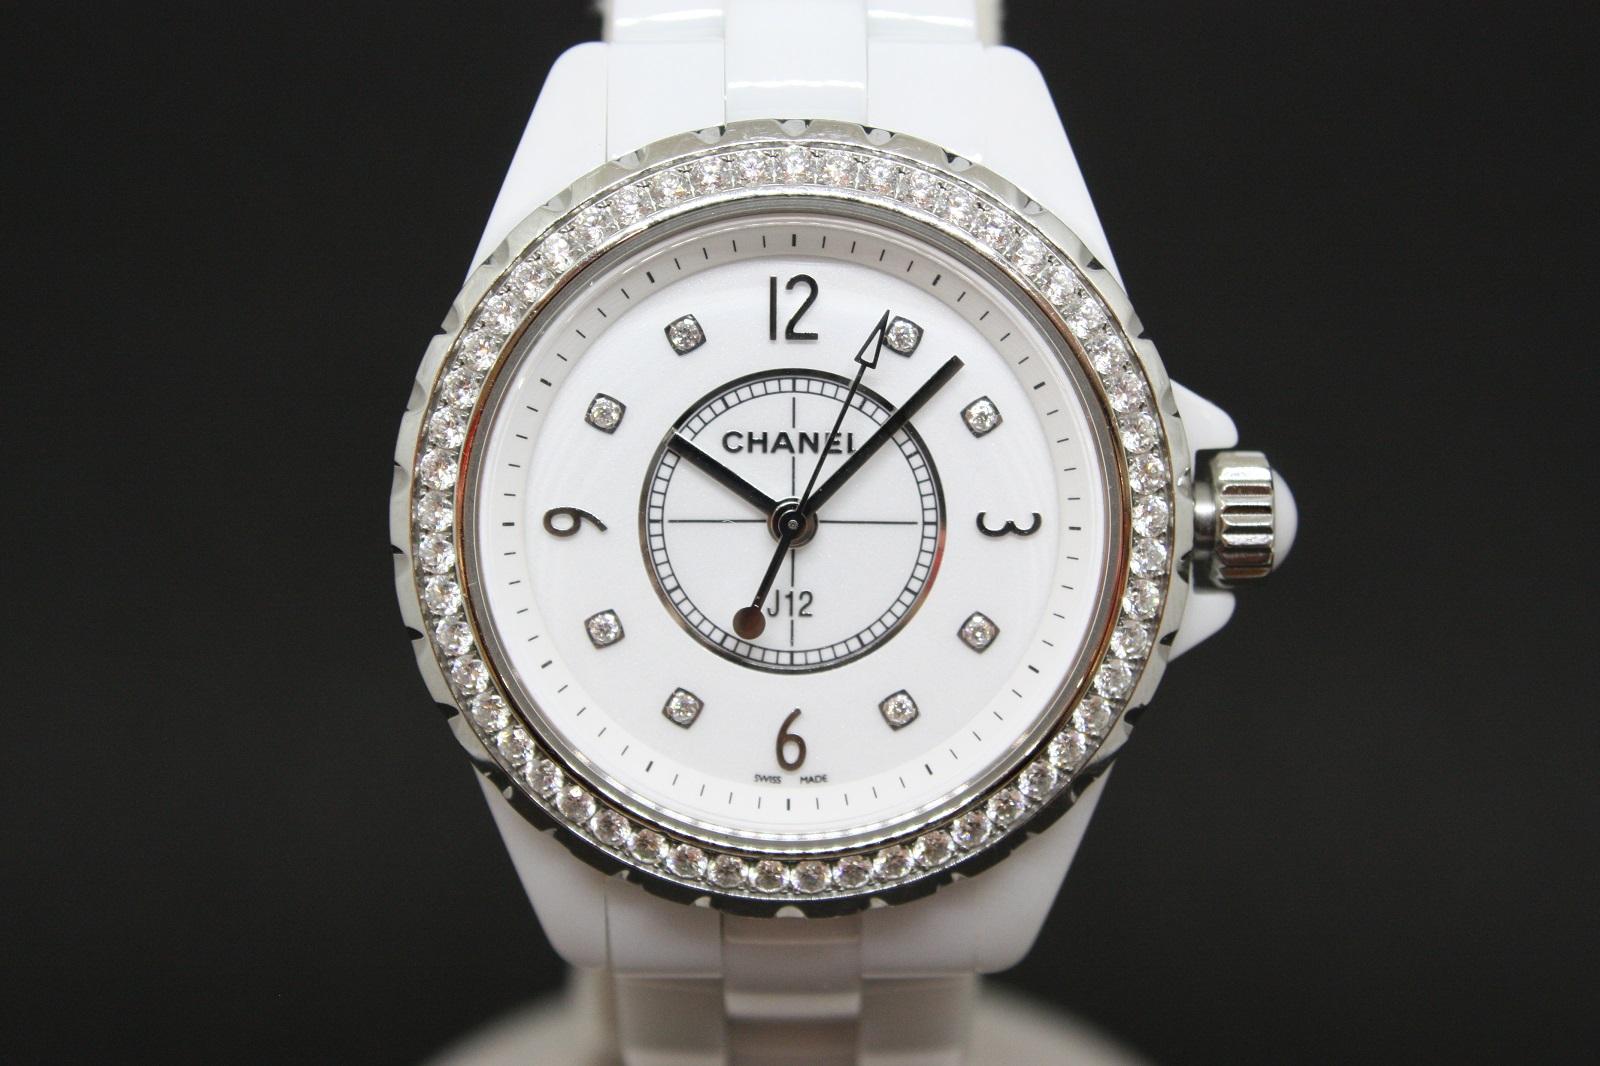 CHANEL J12 H3111 8P ベゼル ダイヤモンド セラミック  ホワイト レディース 腕時計 【中古】